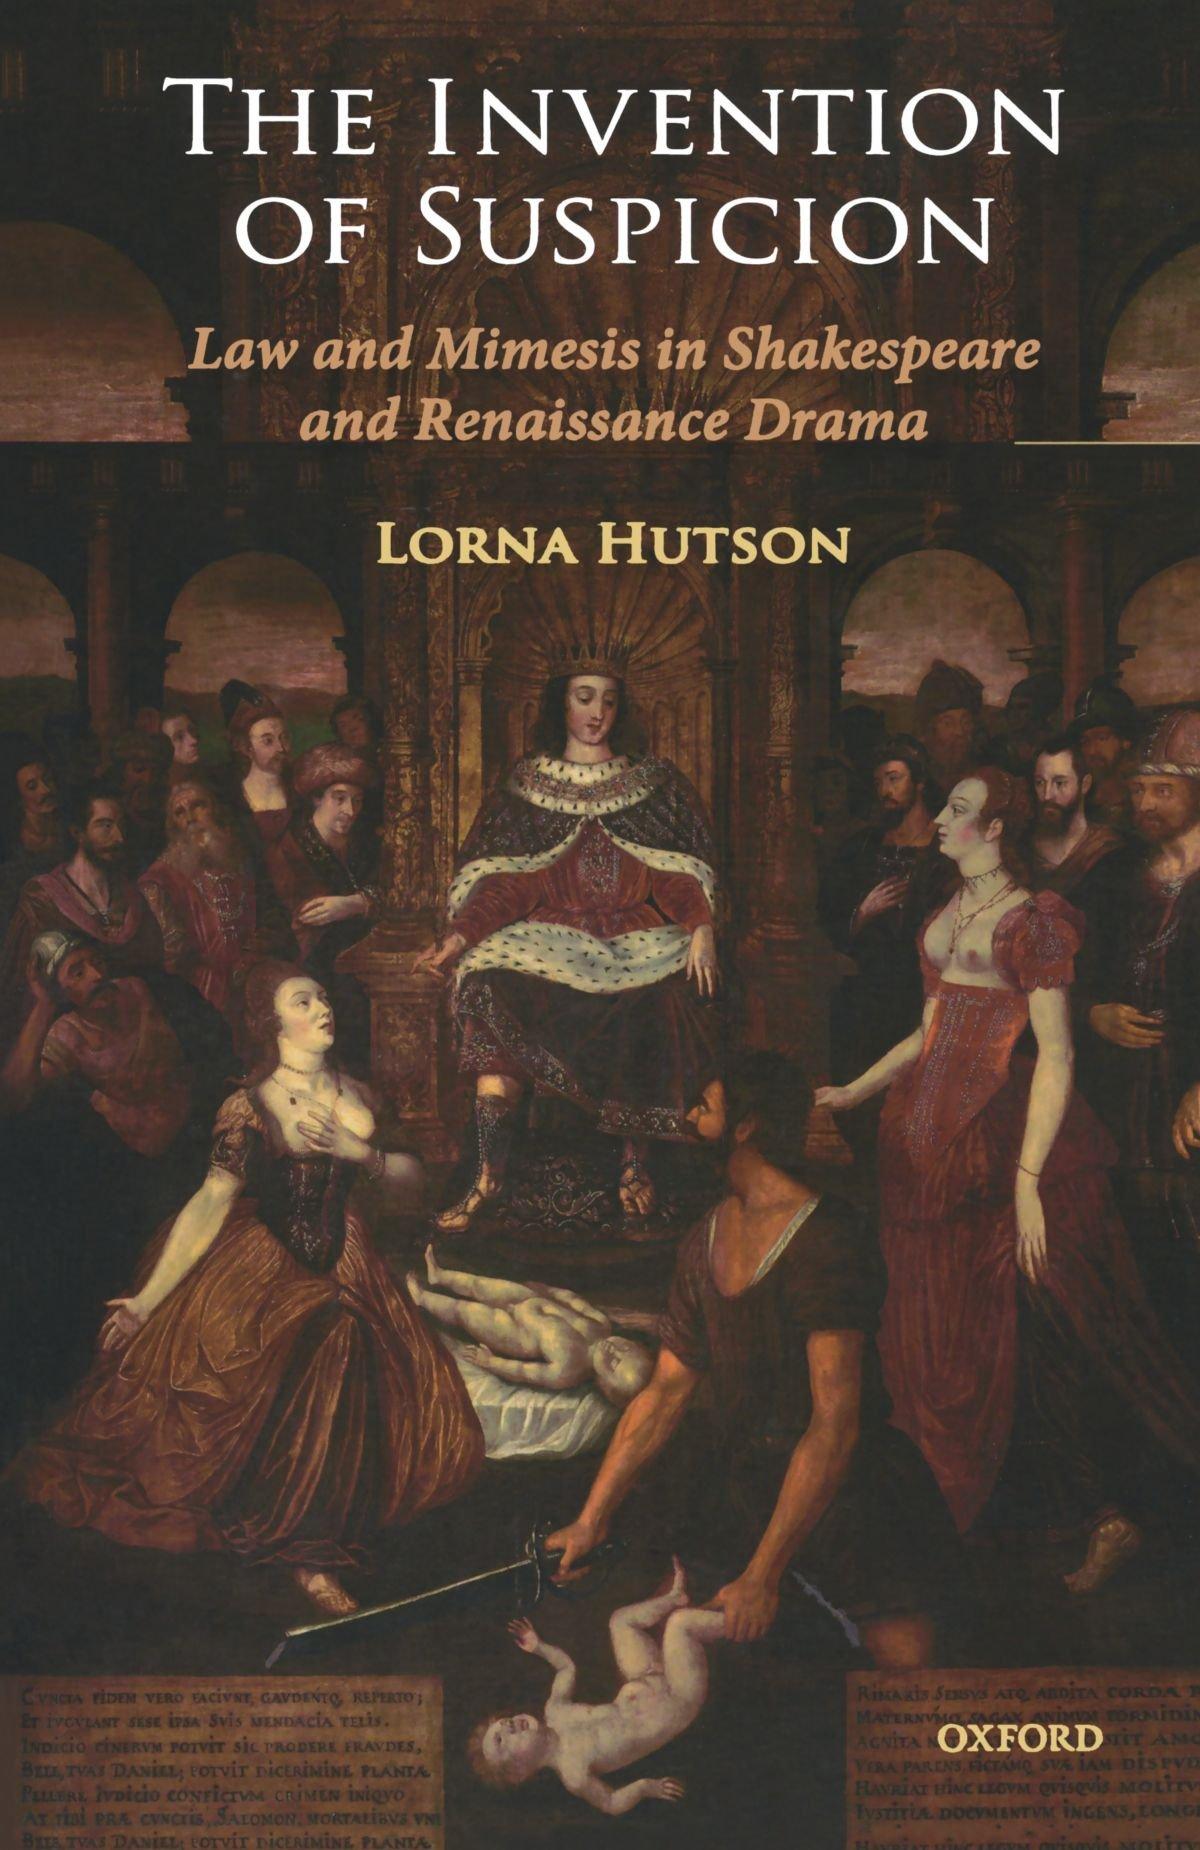 The Invention of Suspicion: Law and Mimesis in Shakespeare and Renaissance Drama: Amazon.es: Lorna Hutson: Libros en idiomas extranjeros